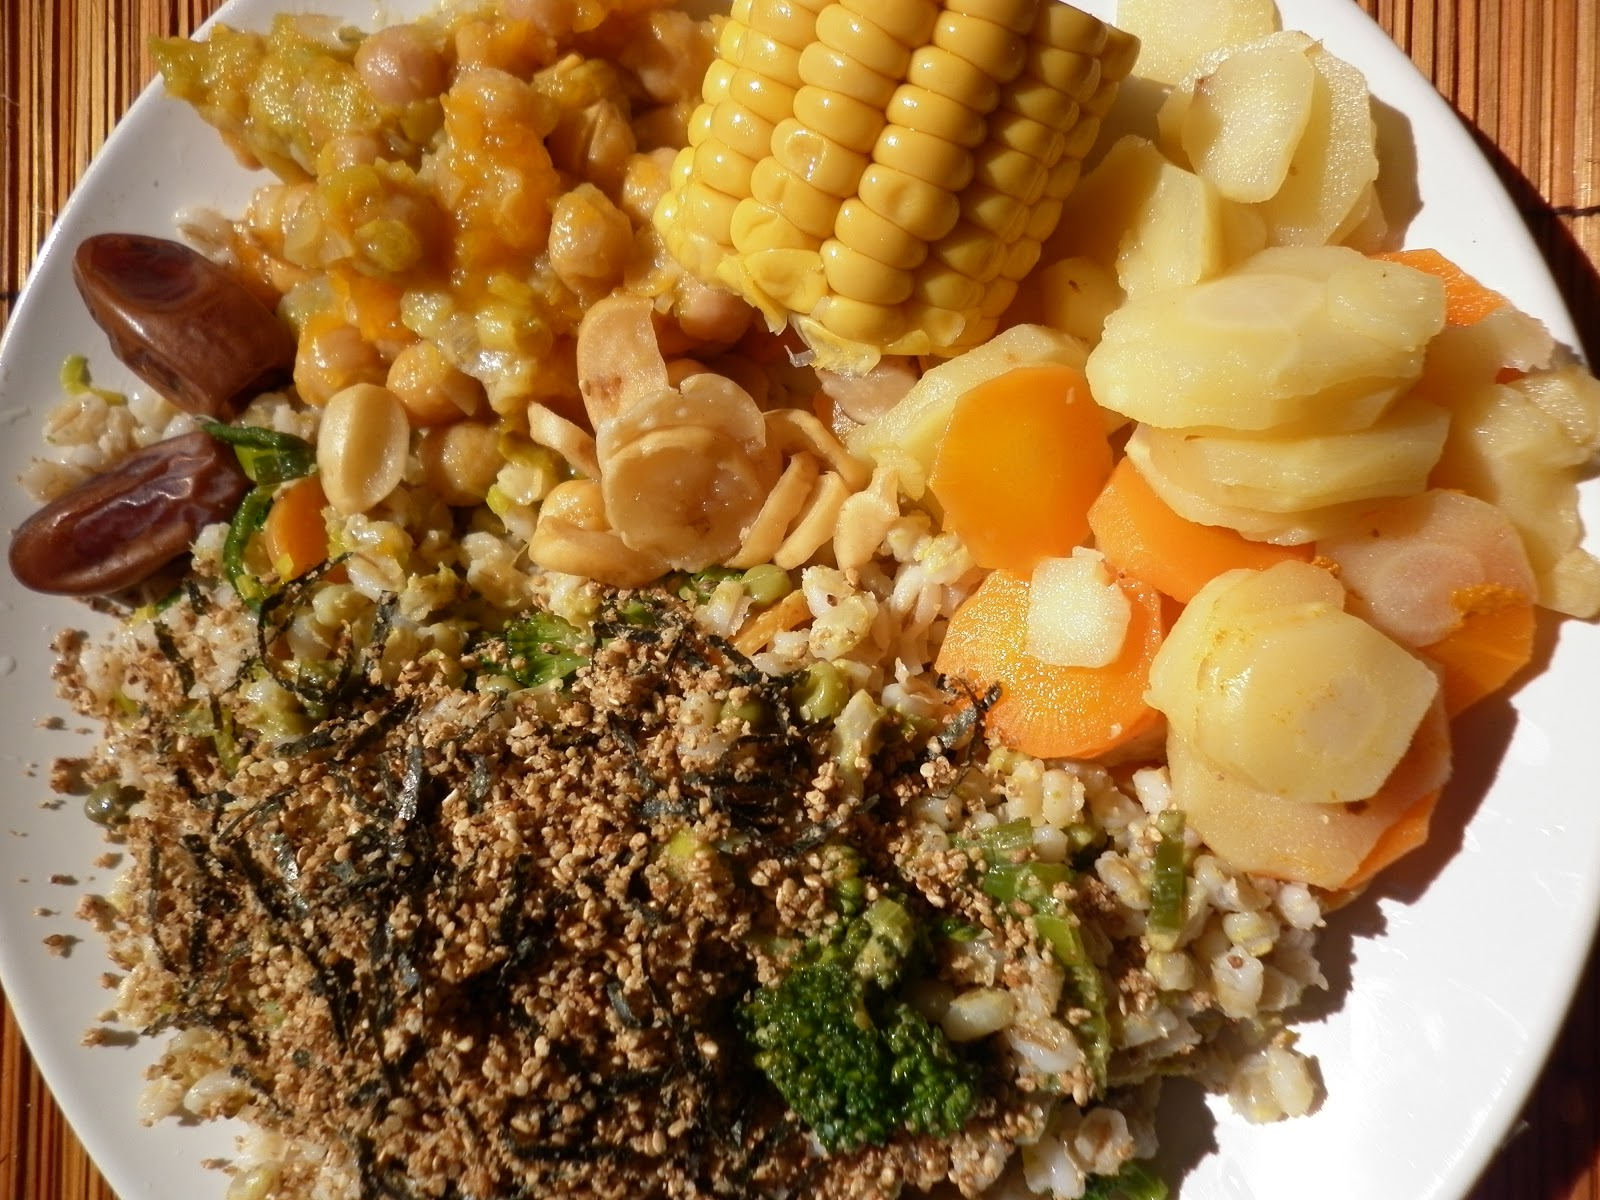 Cocina macrobi tica platos macrobi ticos for Cocina macrobiotica